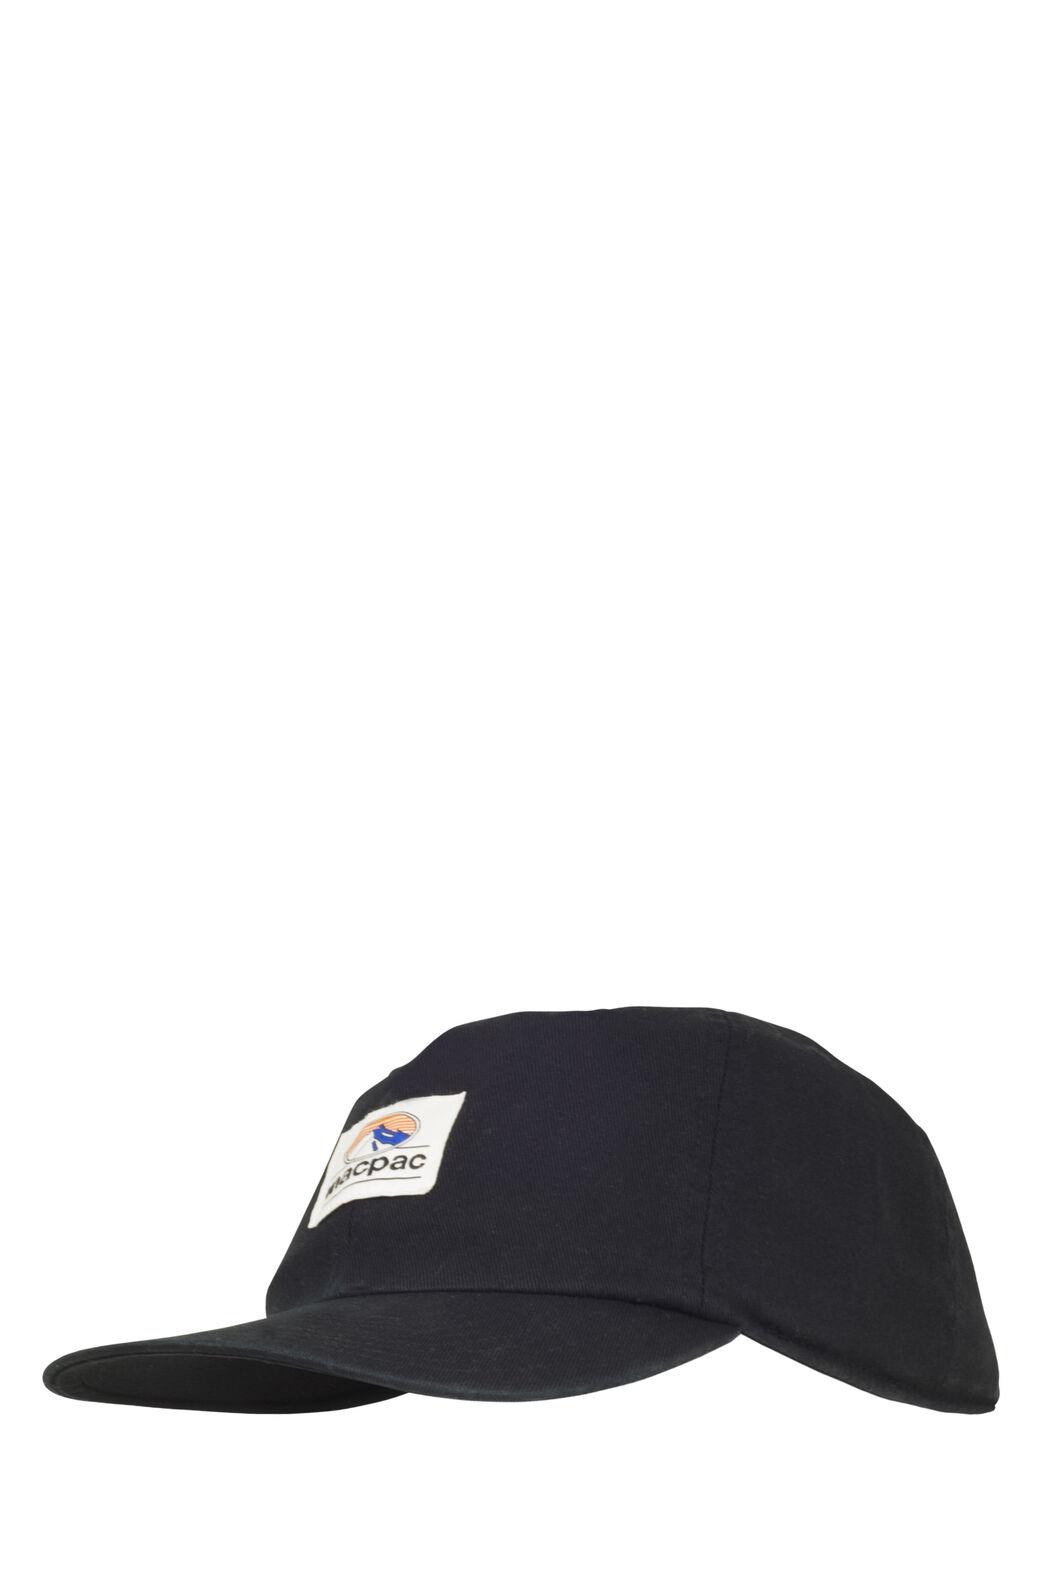 Macpac Vintage Cap, Black Patch, hi-res